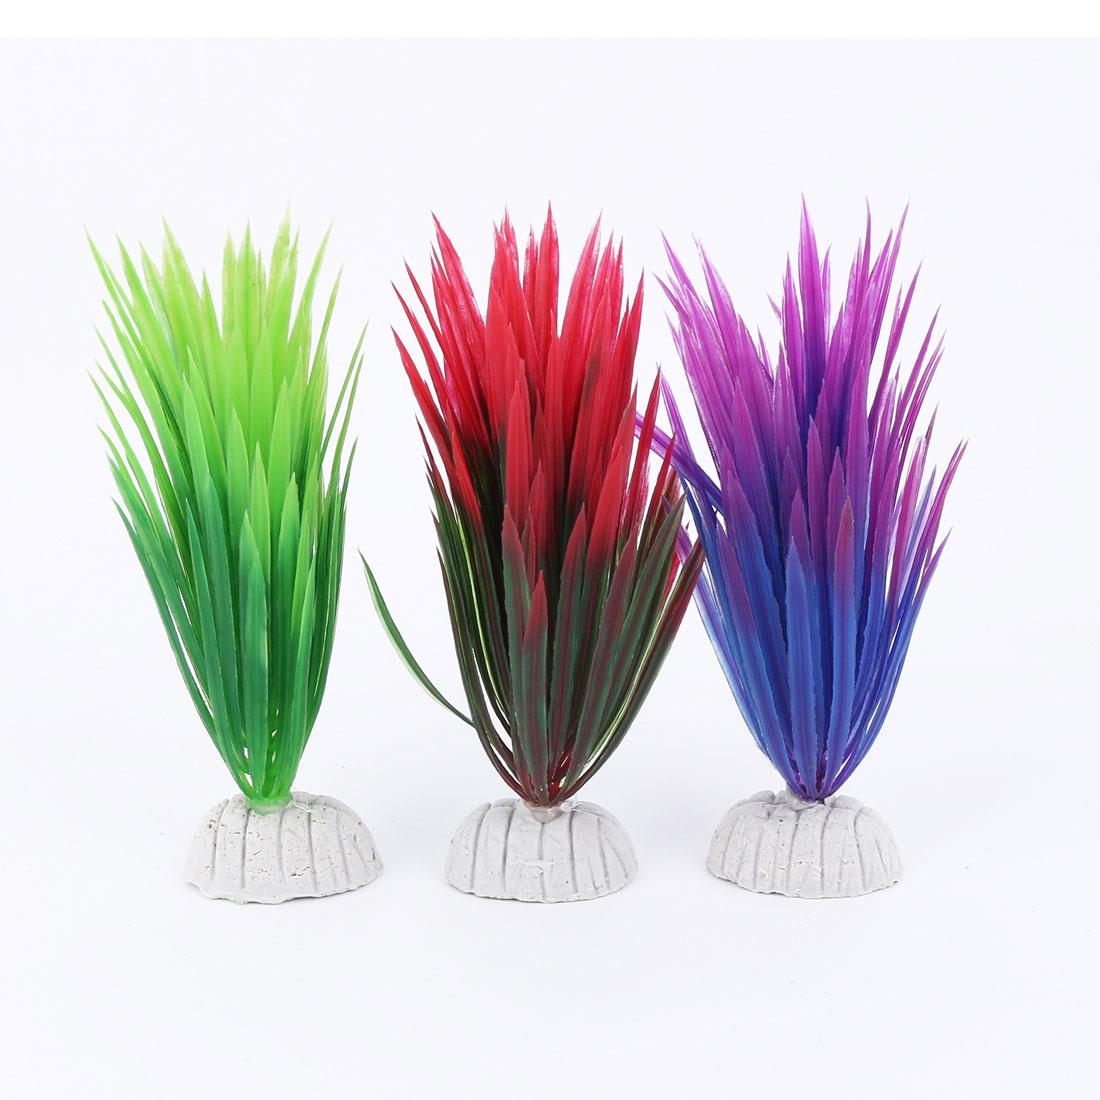 Plastic Fish Tank Emulational Water Grass Plants Decoration Colorful 3 Pcs